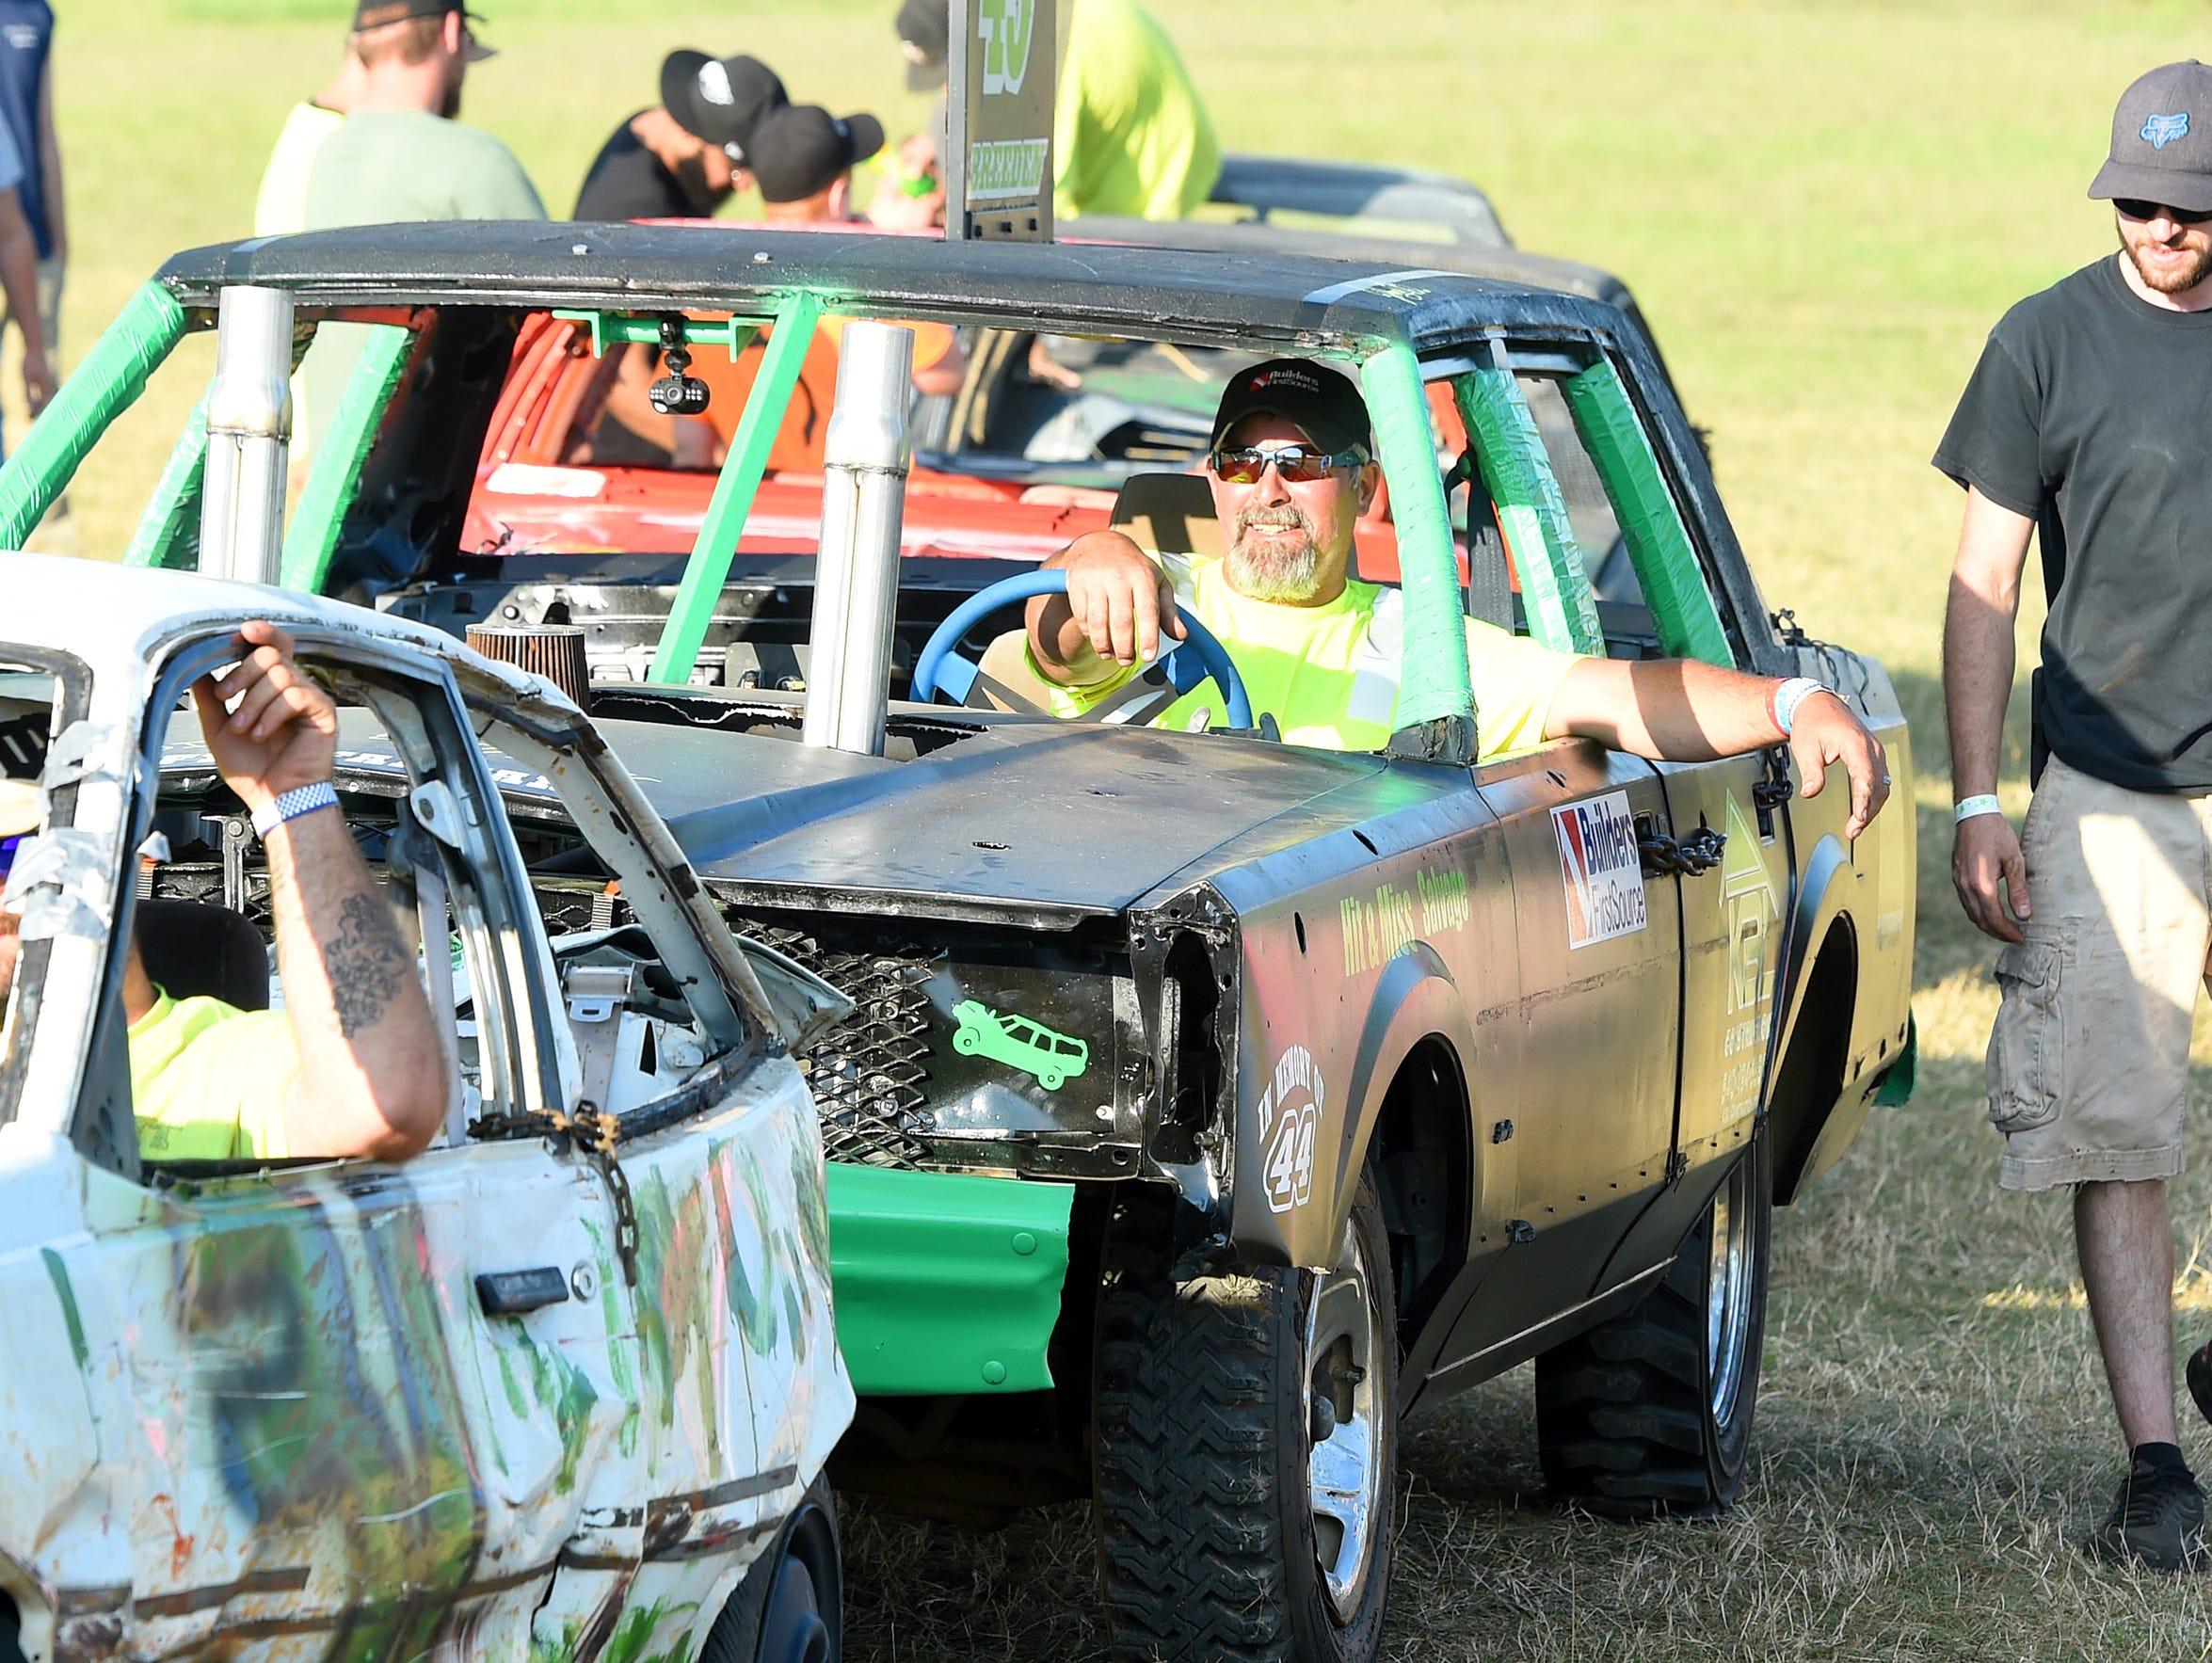 Behind the wheel, John Breeden of New Hope has his